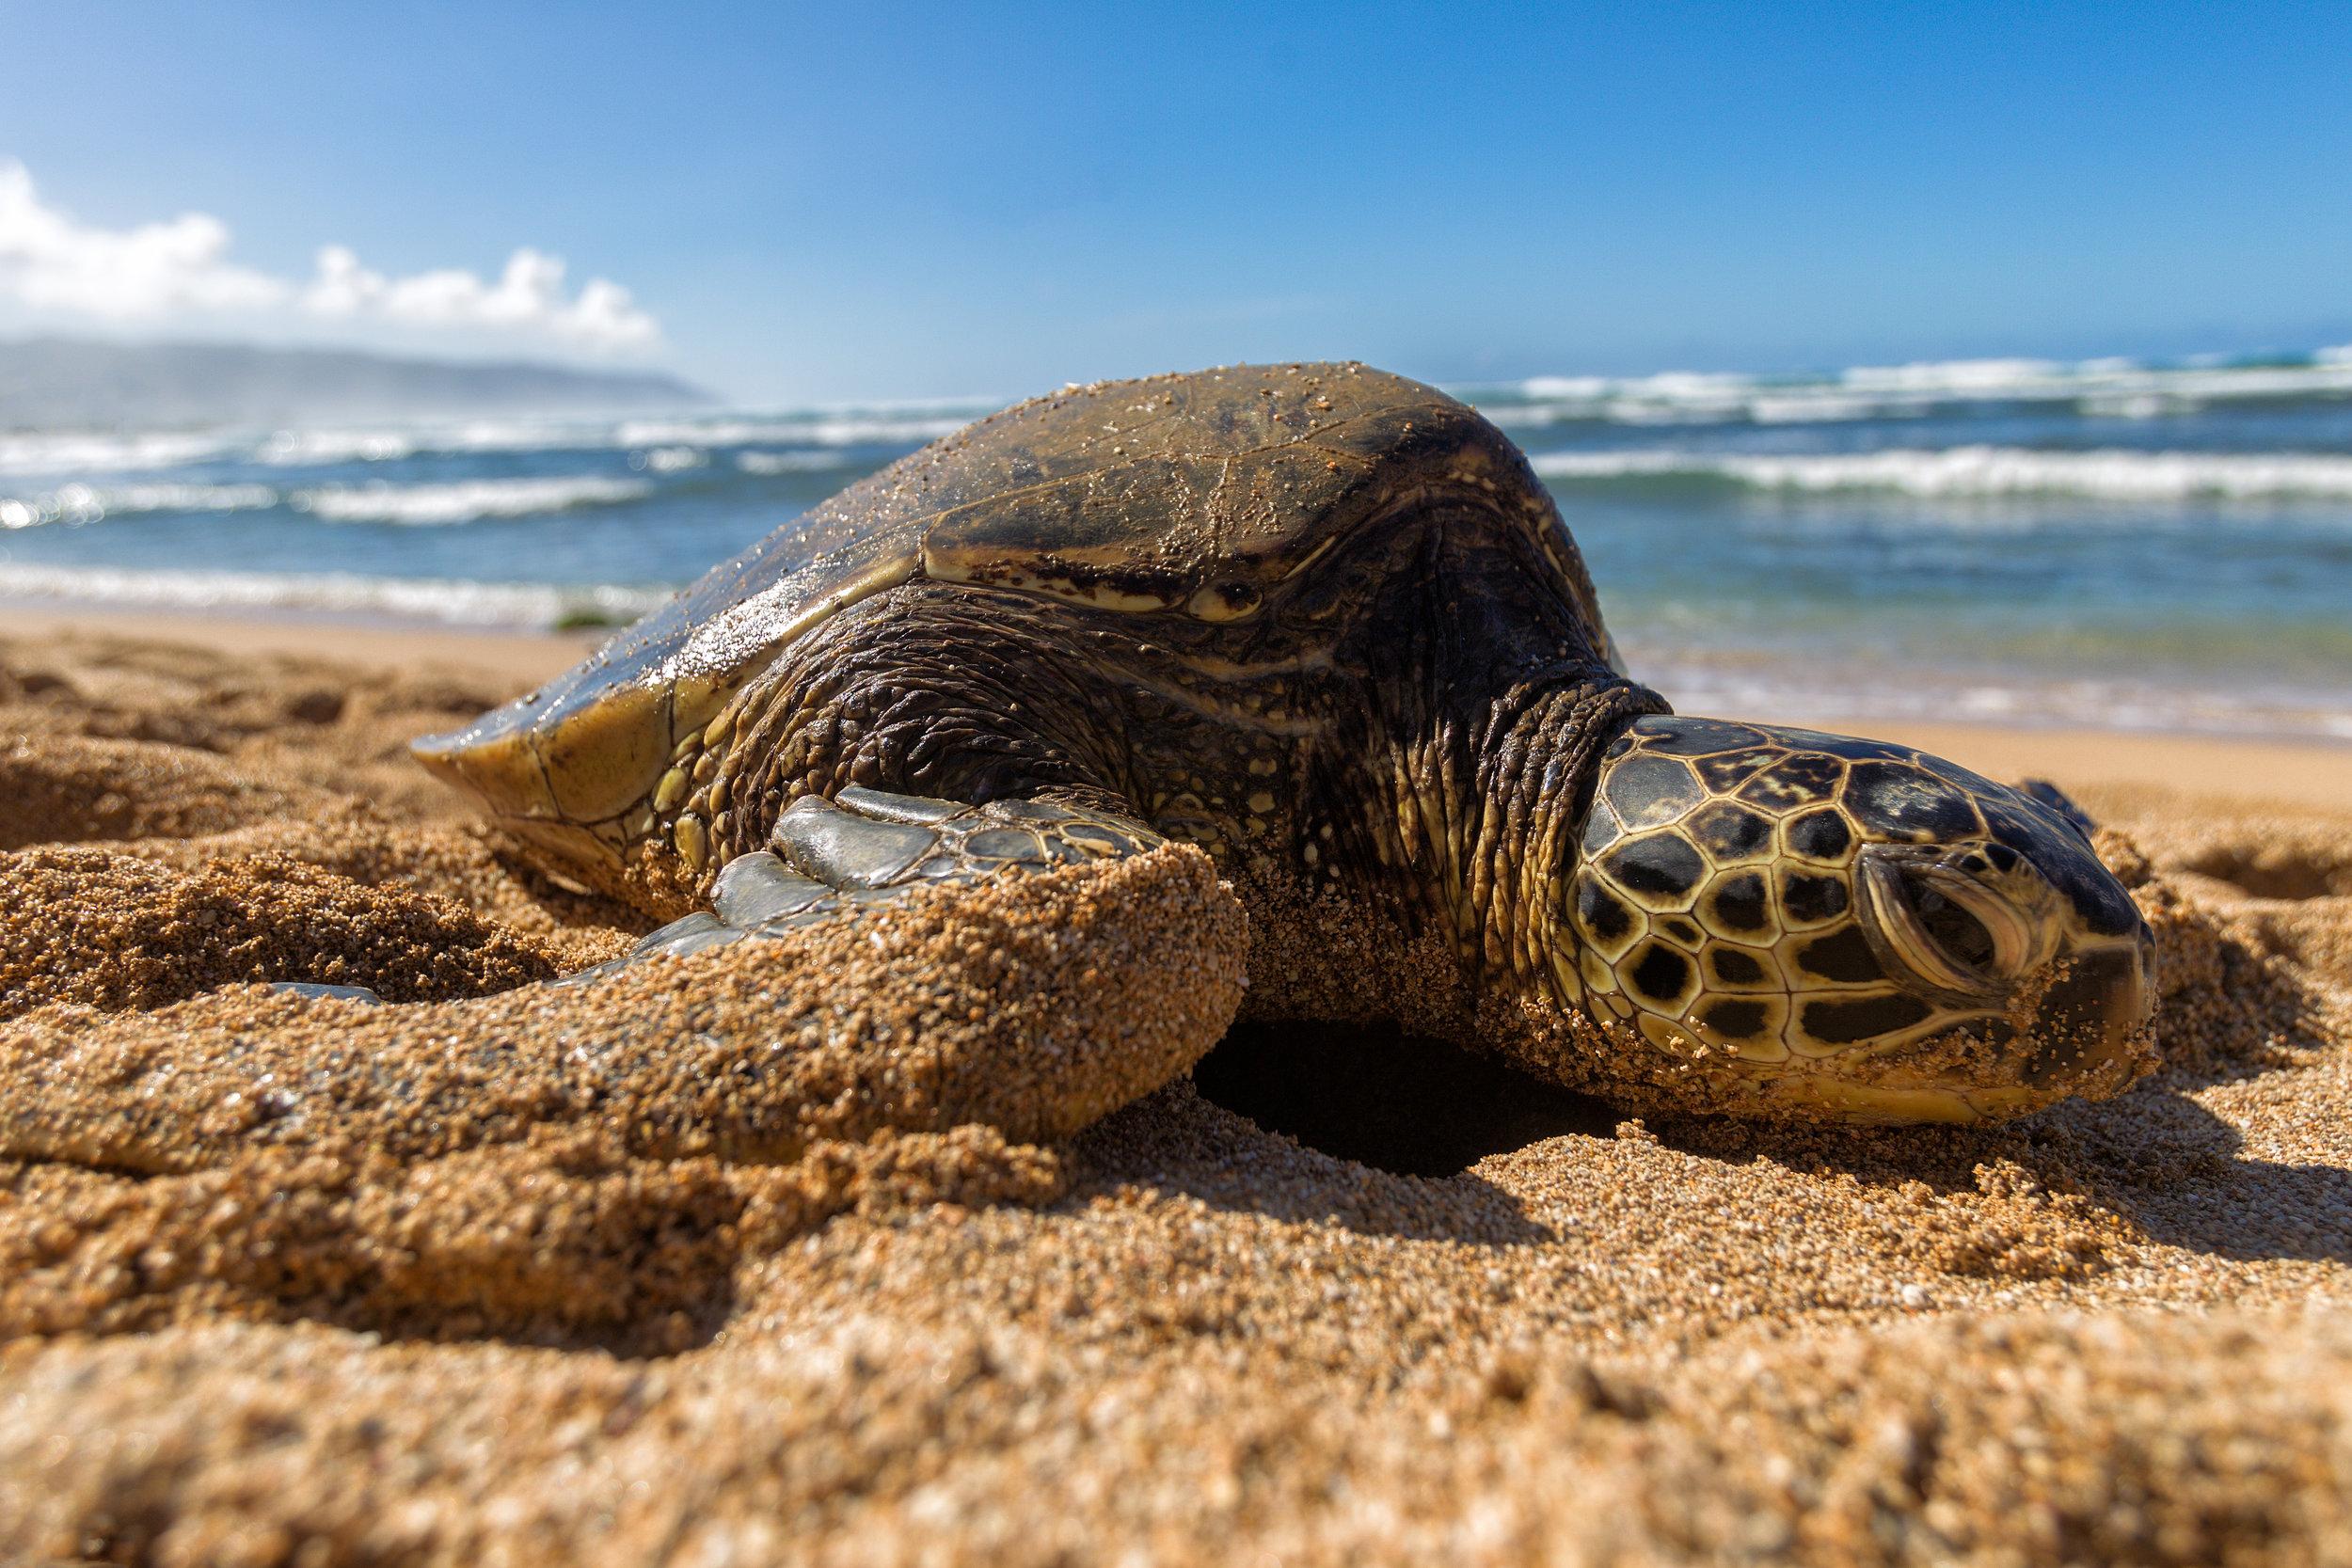 Sea-Turtle-Beached-Day.jpg